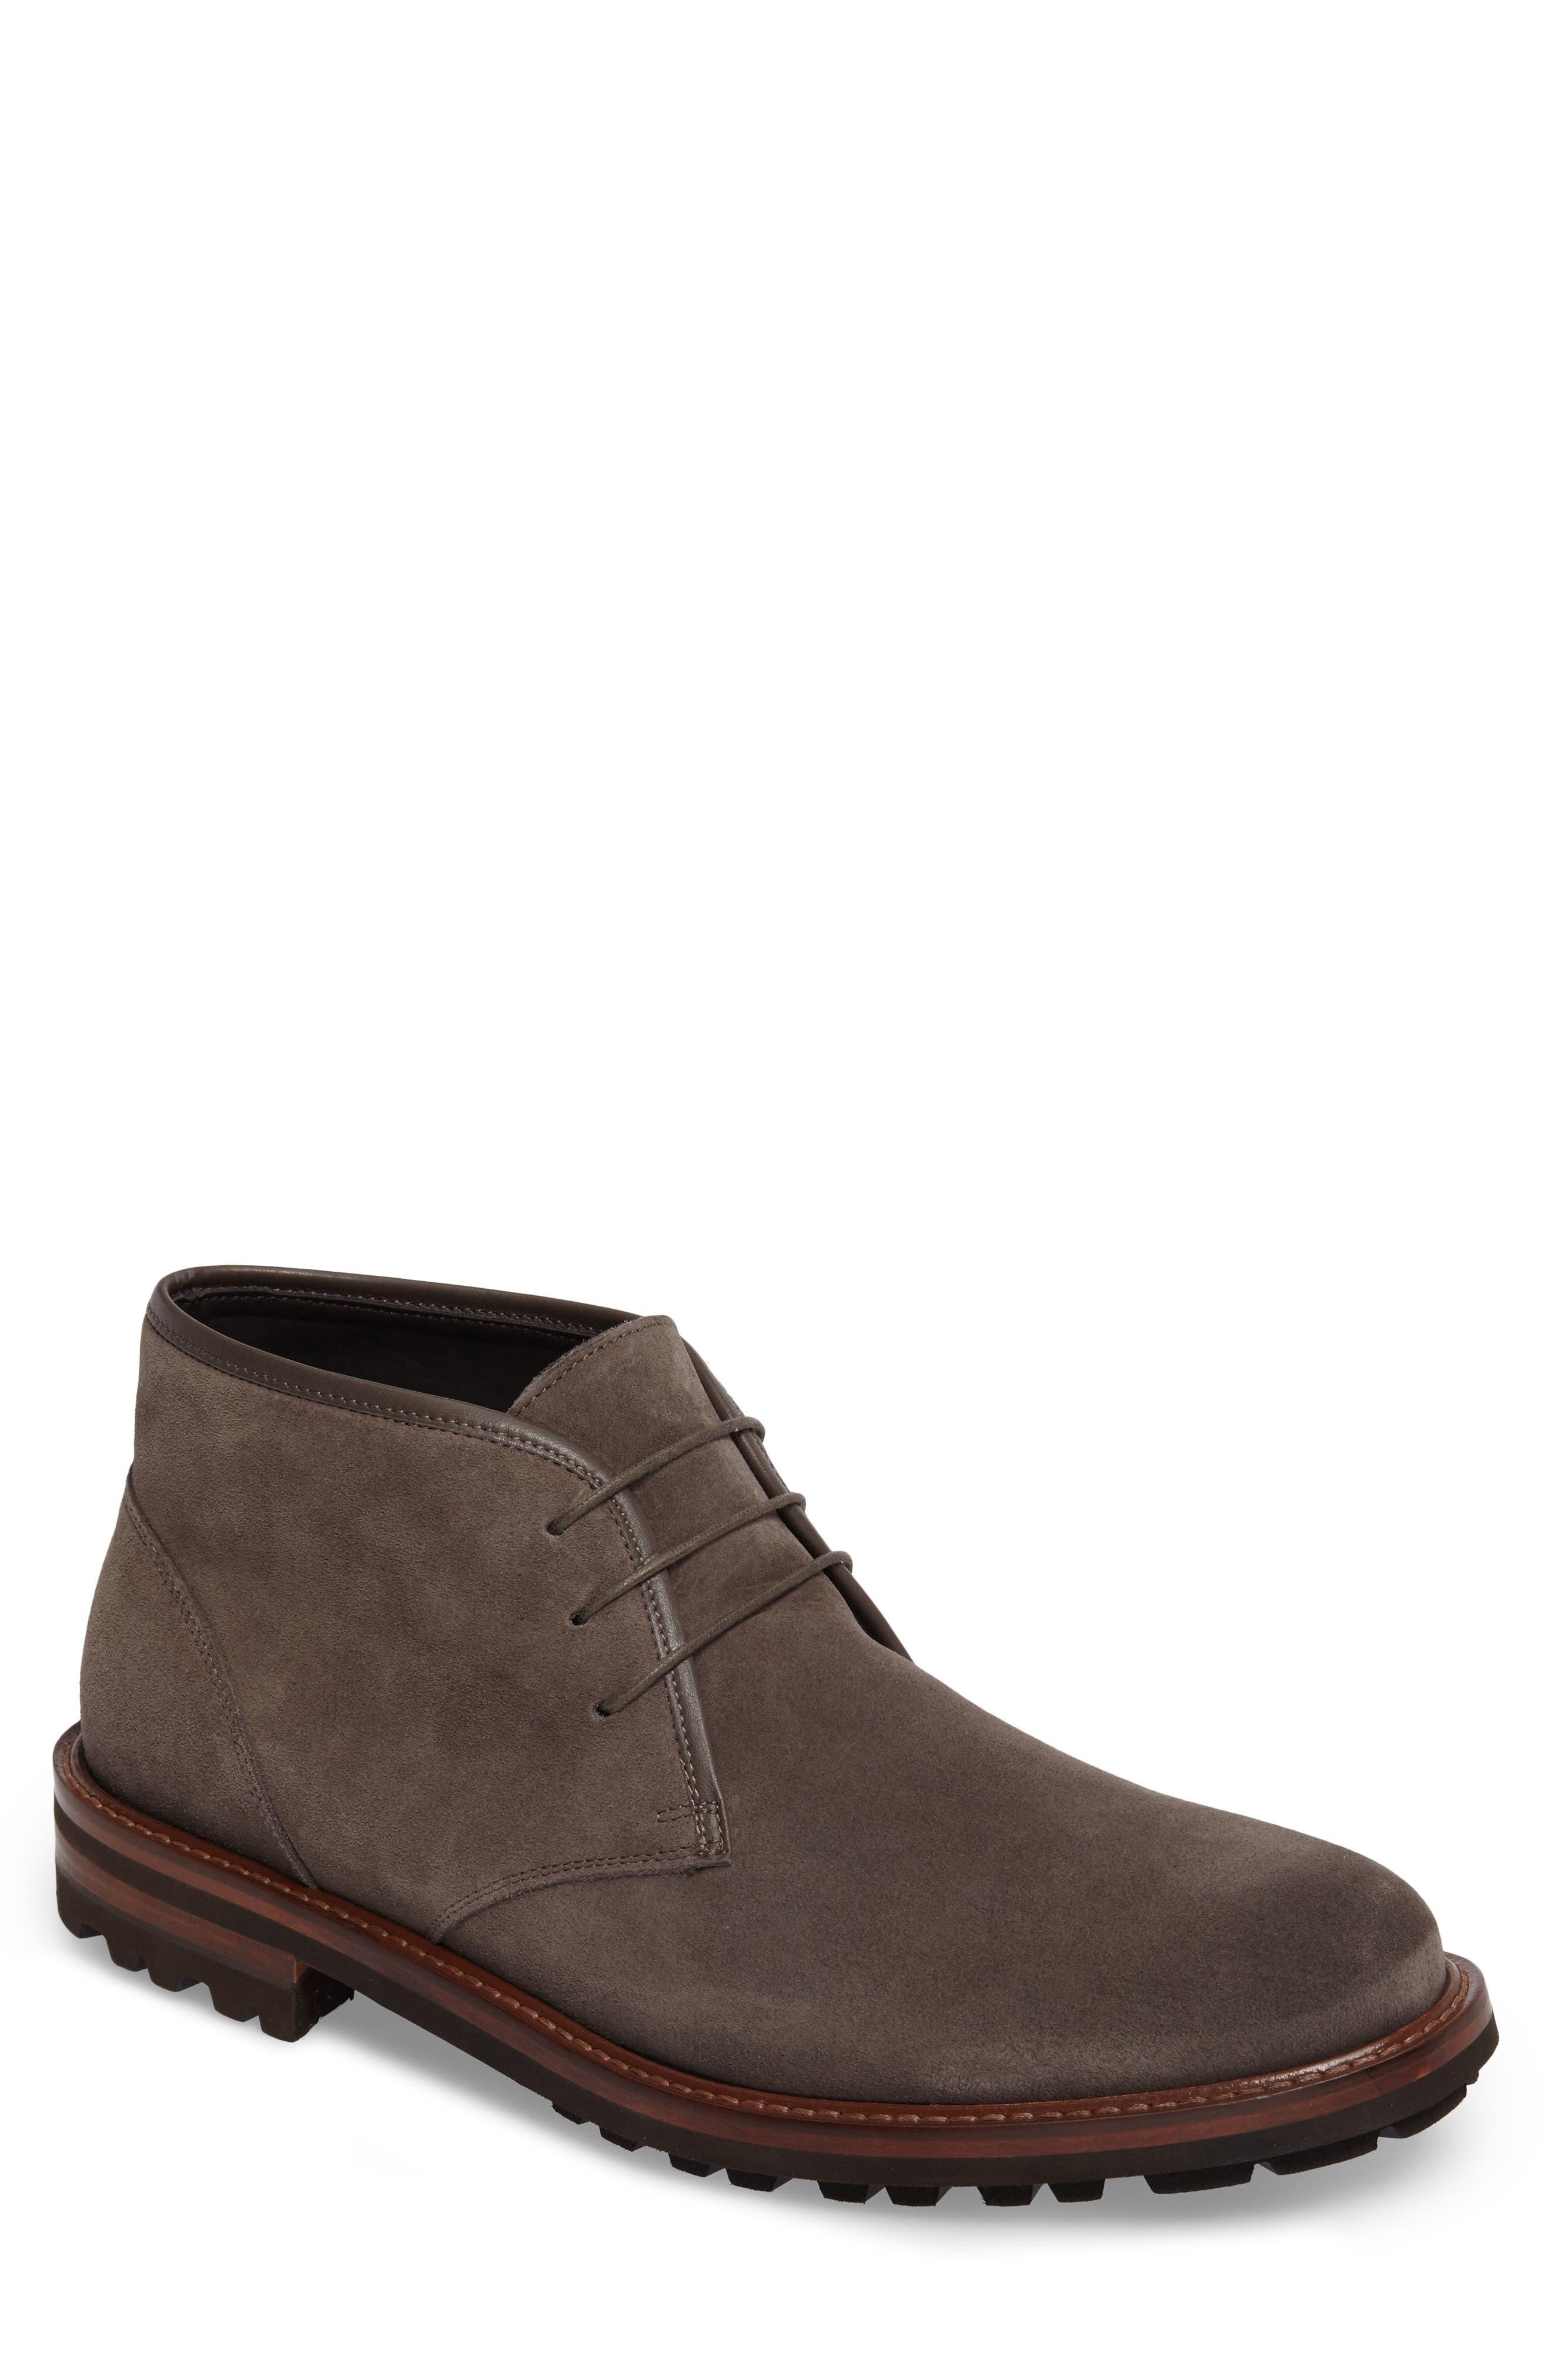 Monte Rosso Brixen Chukka Boot (Men)